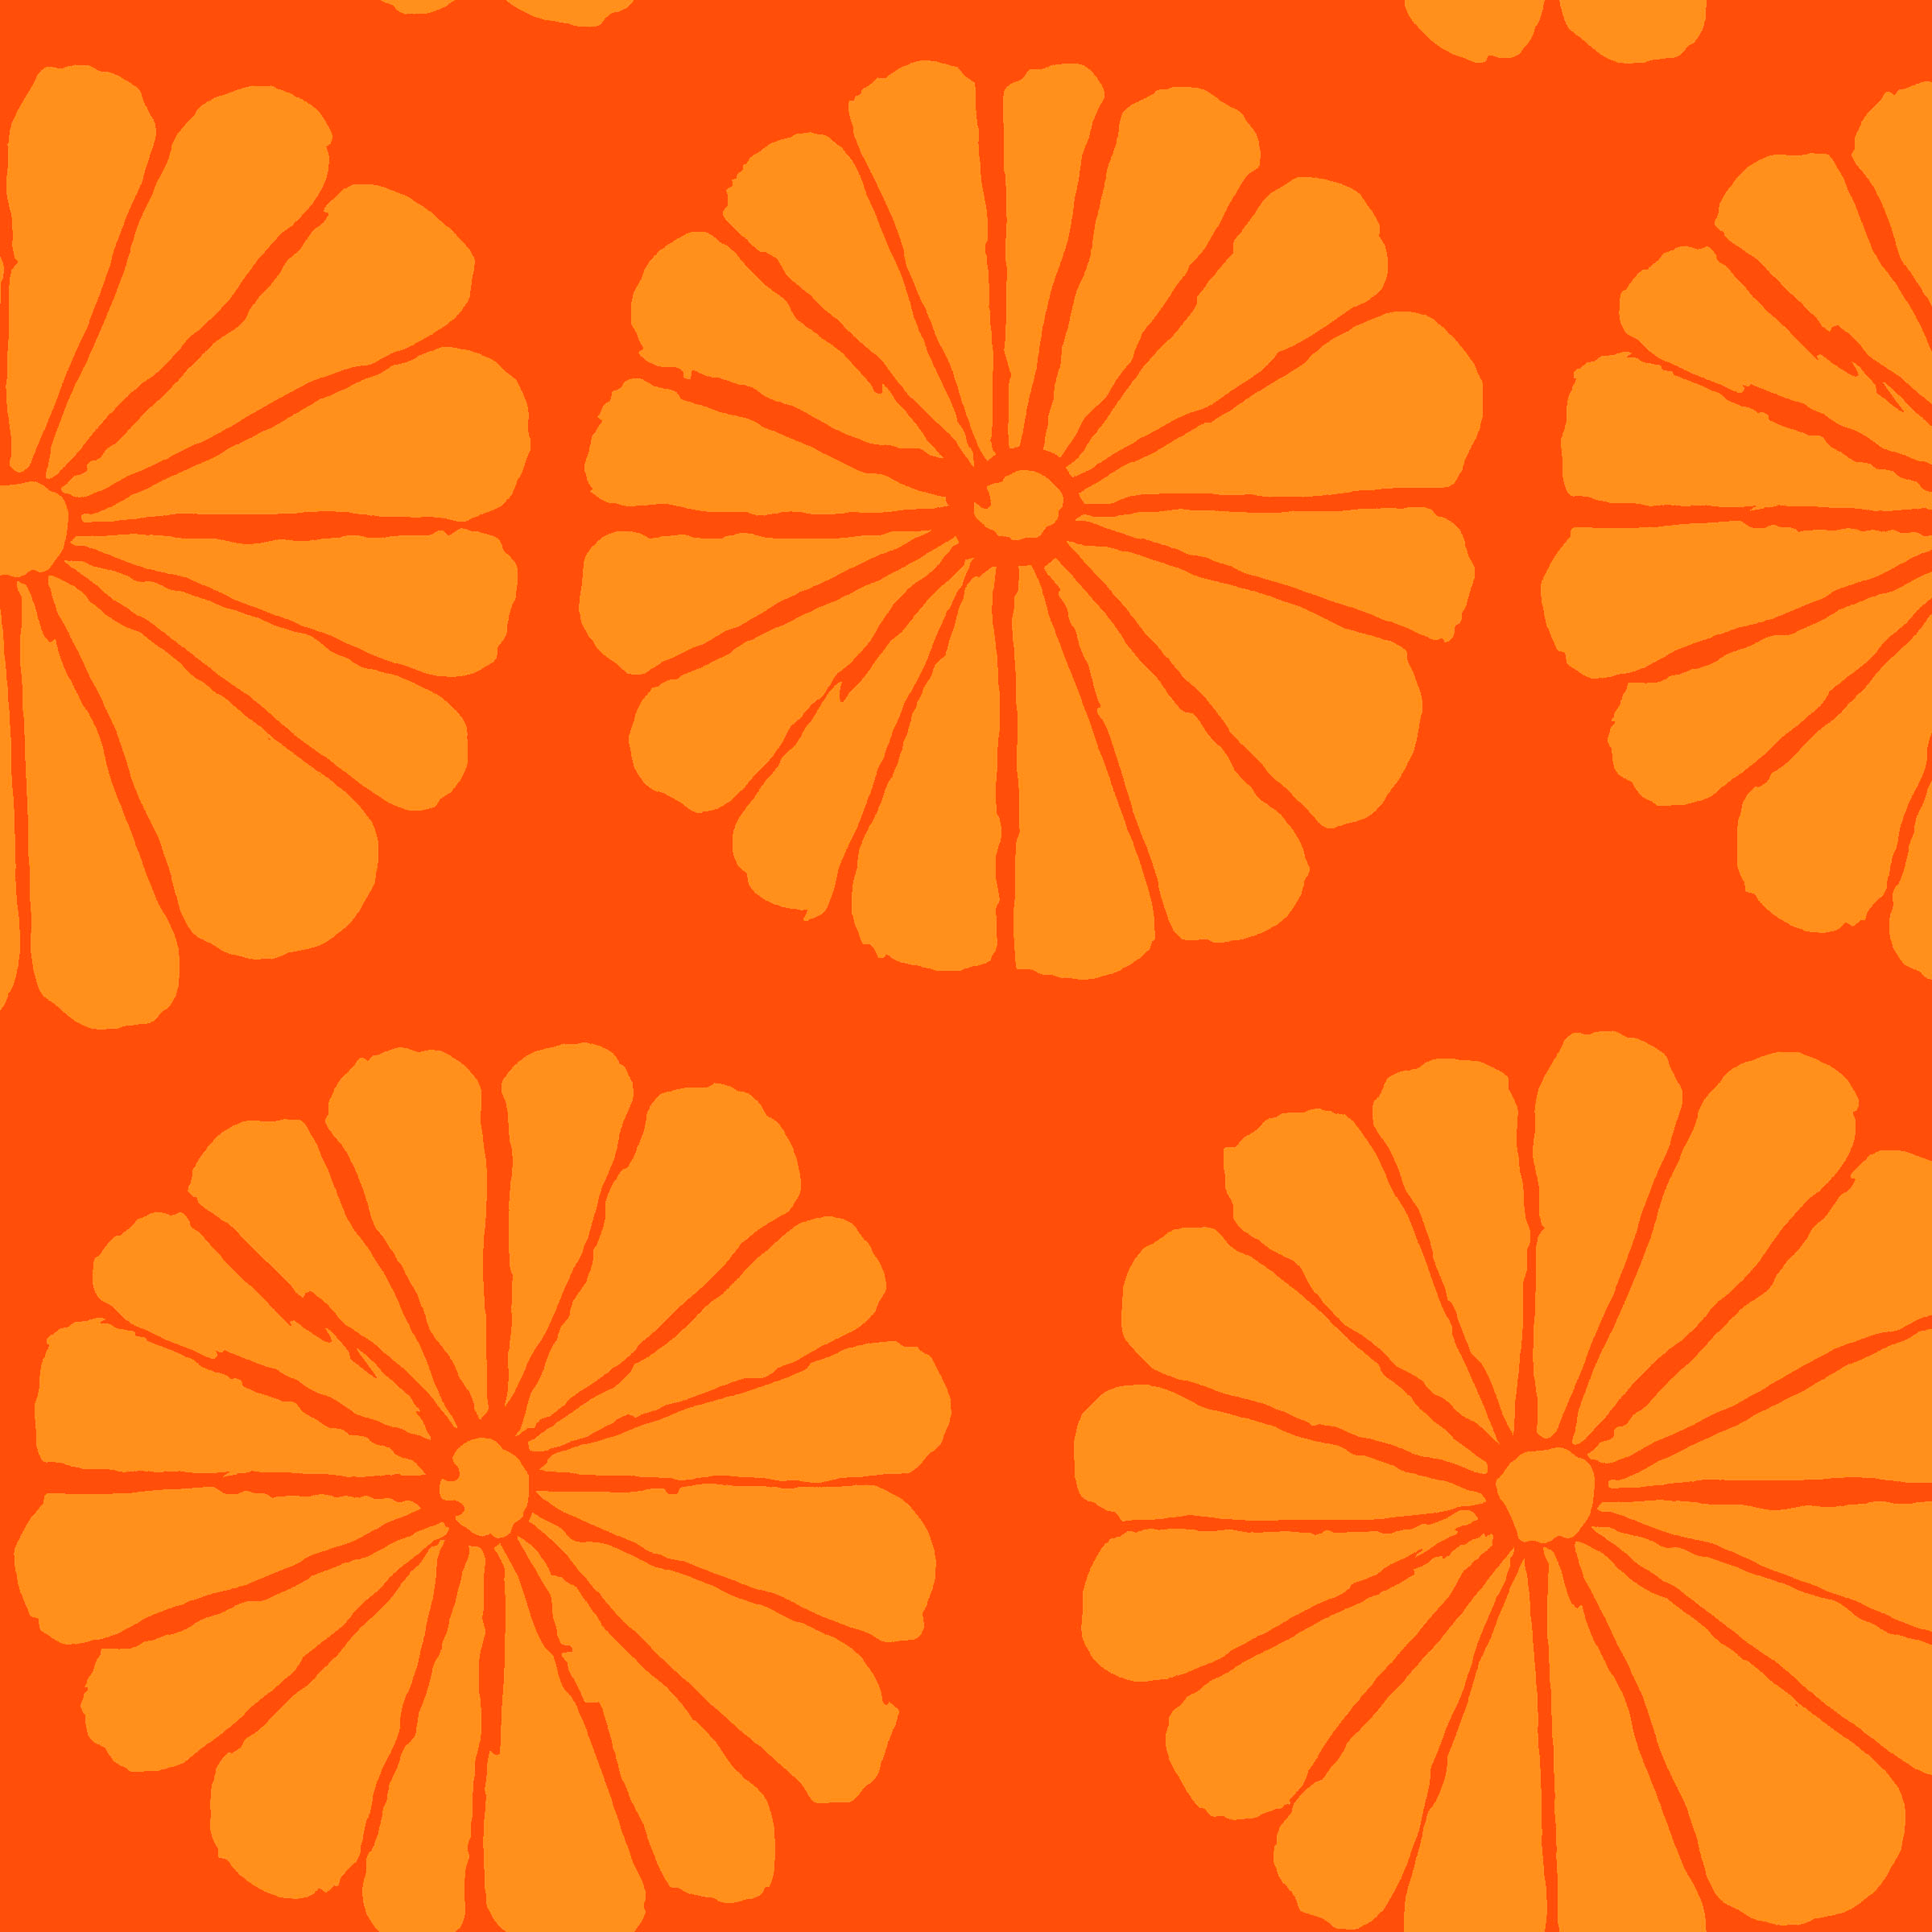 Damask Flower - PWGP183 - Orange